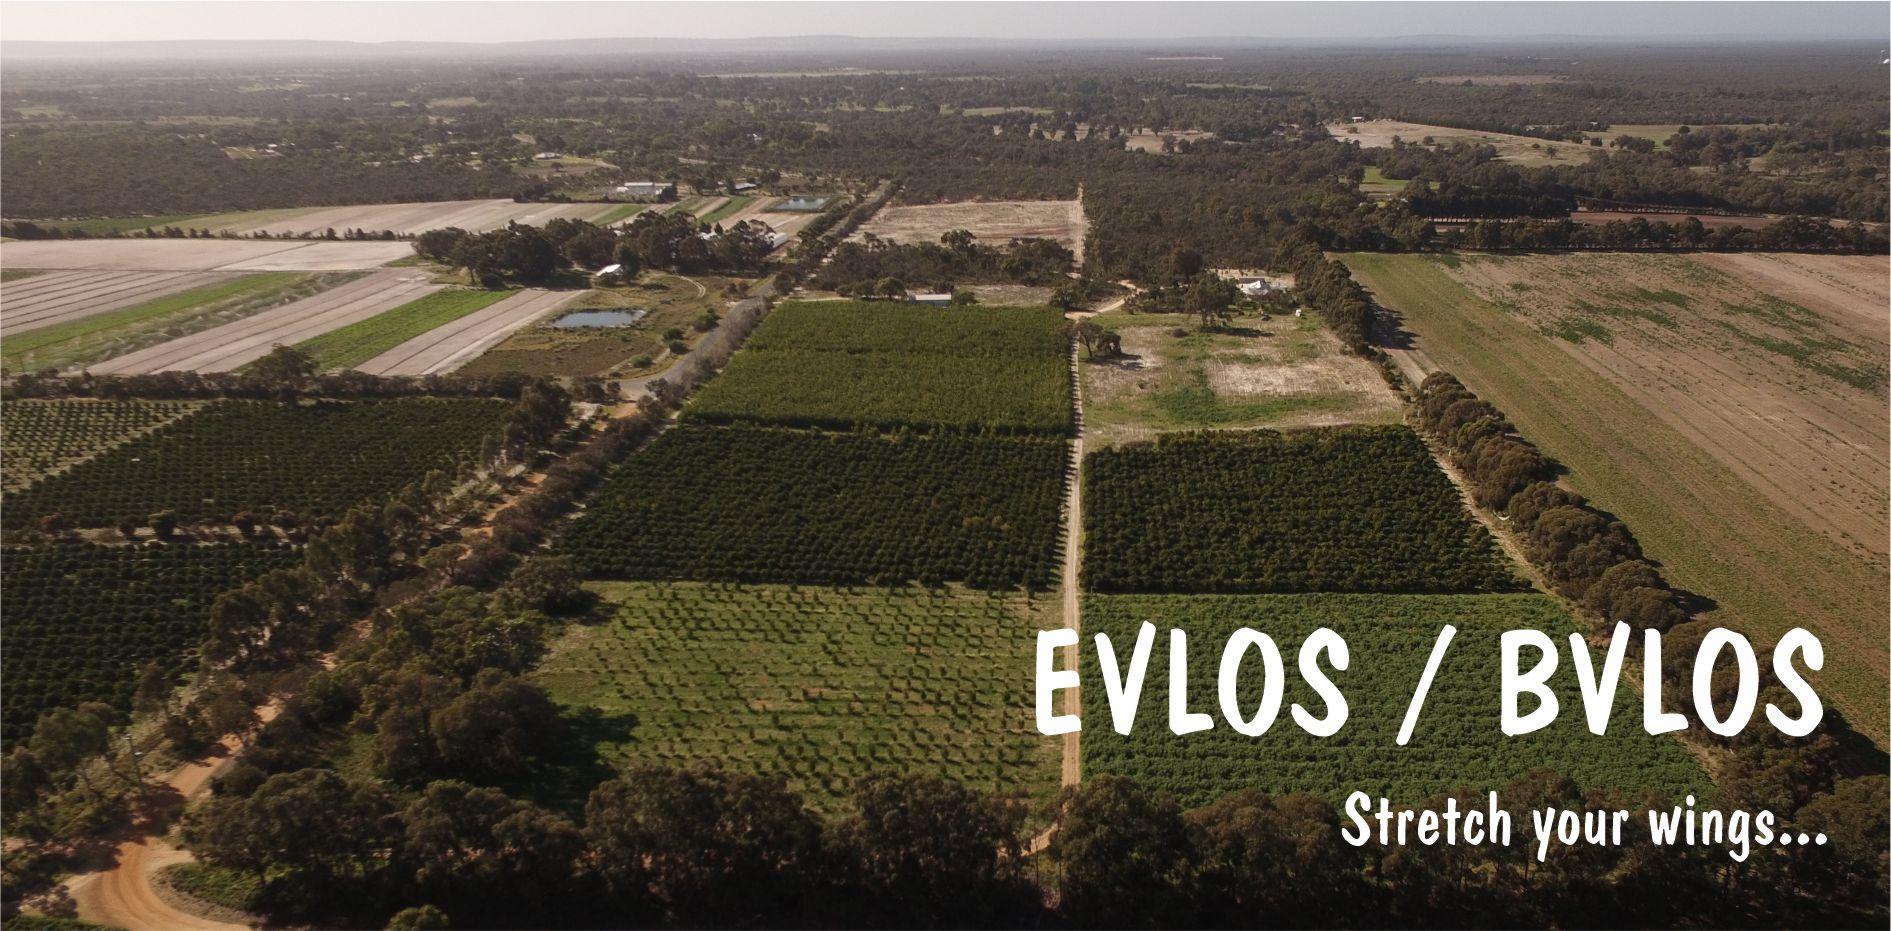 BVLOS / EVLOS - Expand your horizon